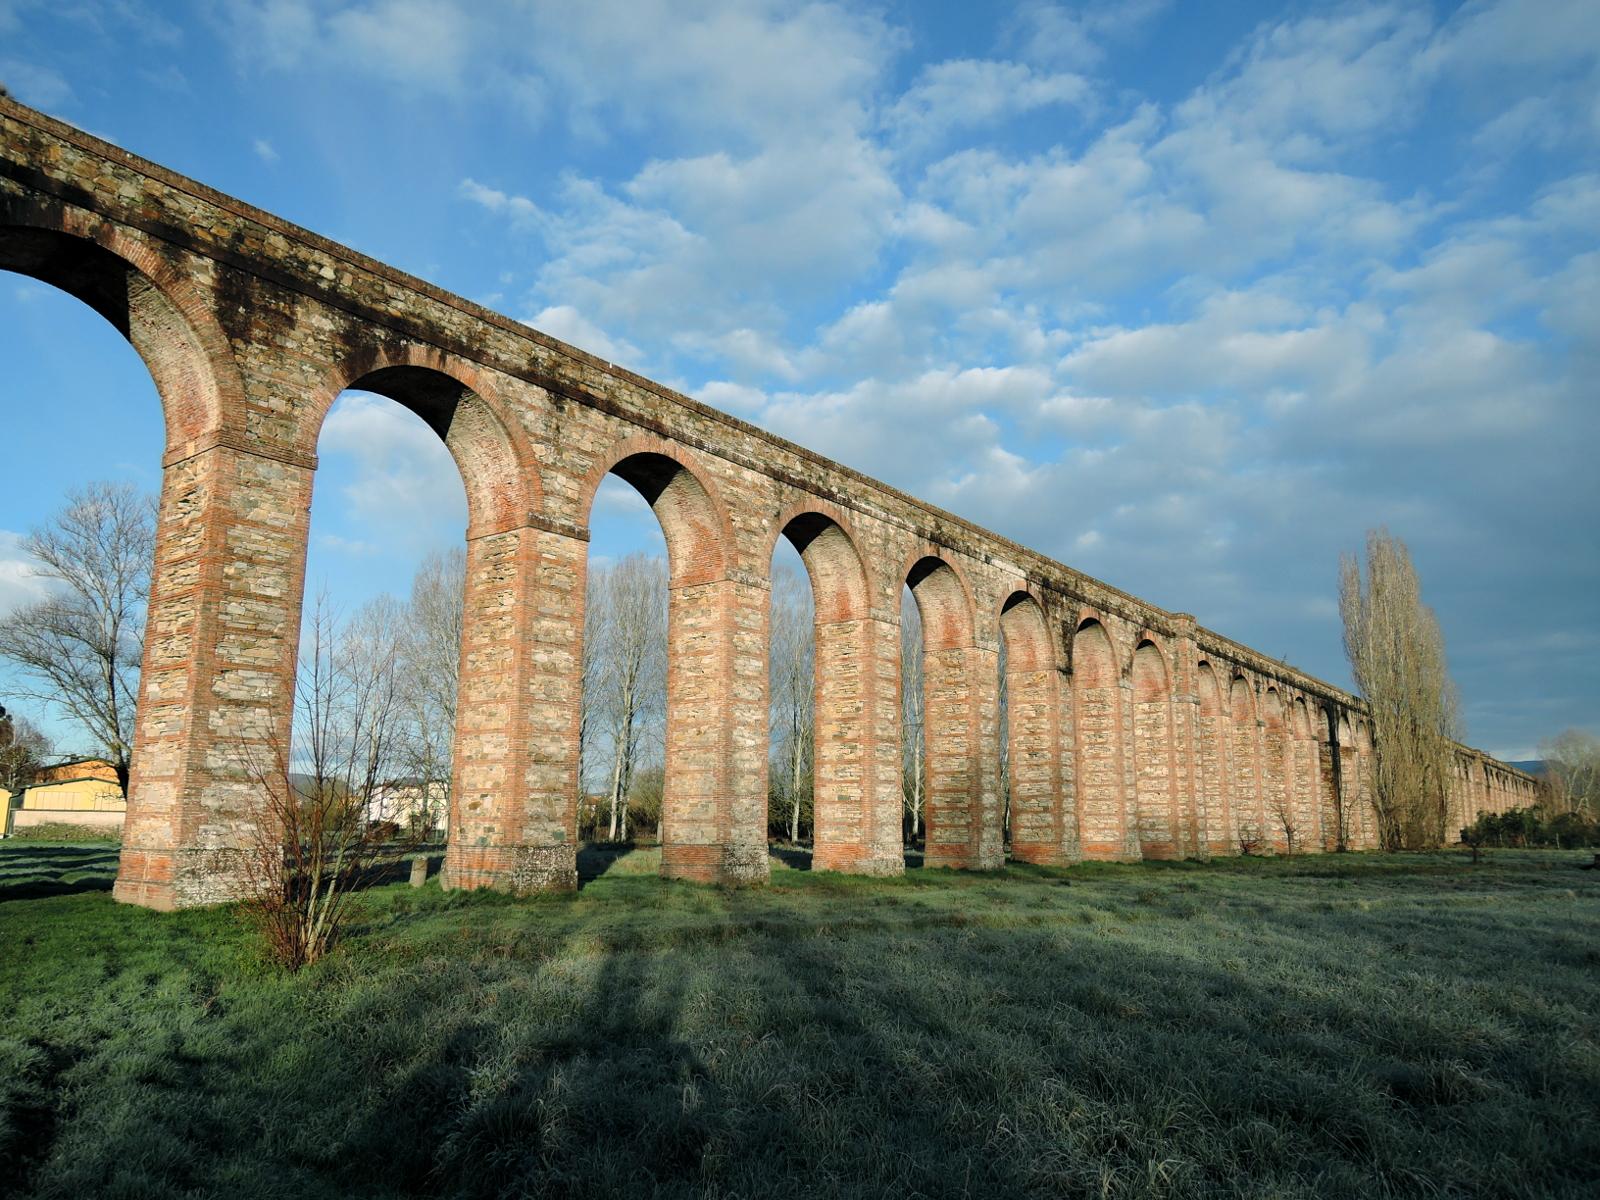 Nottolini aquaduct